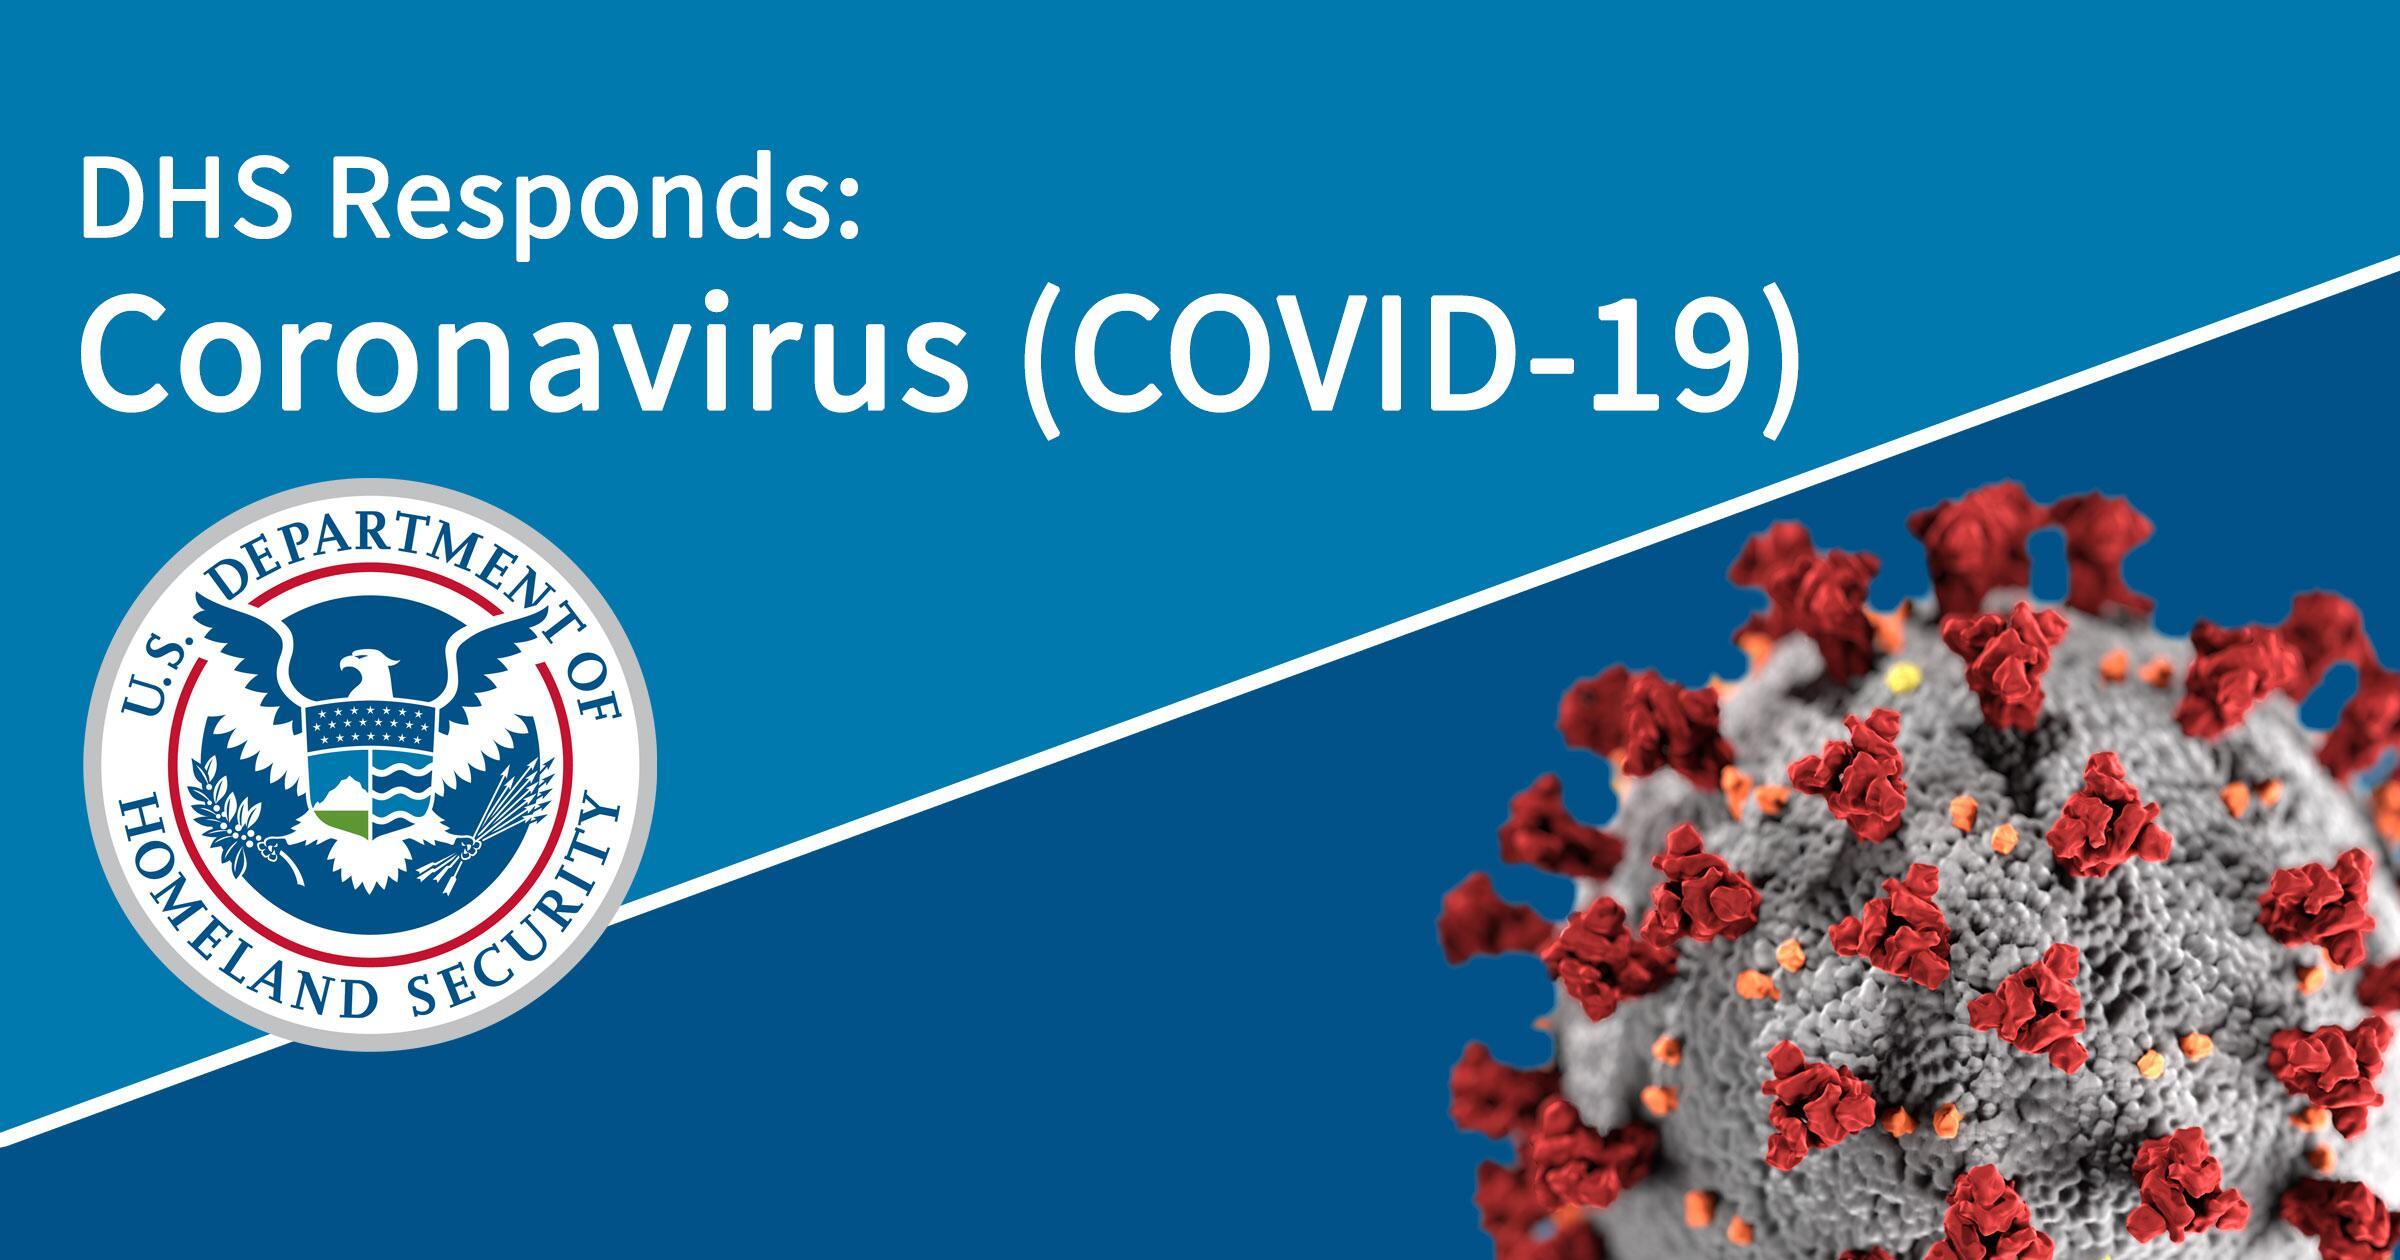 Photo of Department of Homeland Security Response to Coronavirus